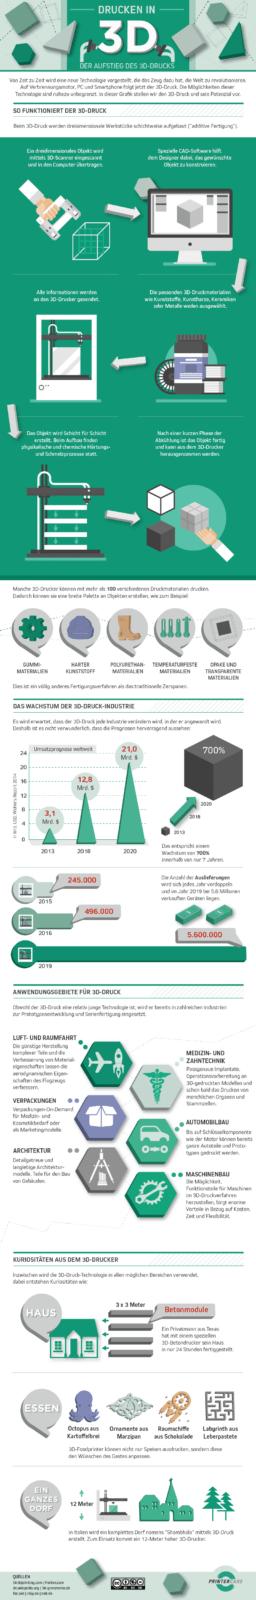 Drucken in 3D - Infografik